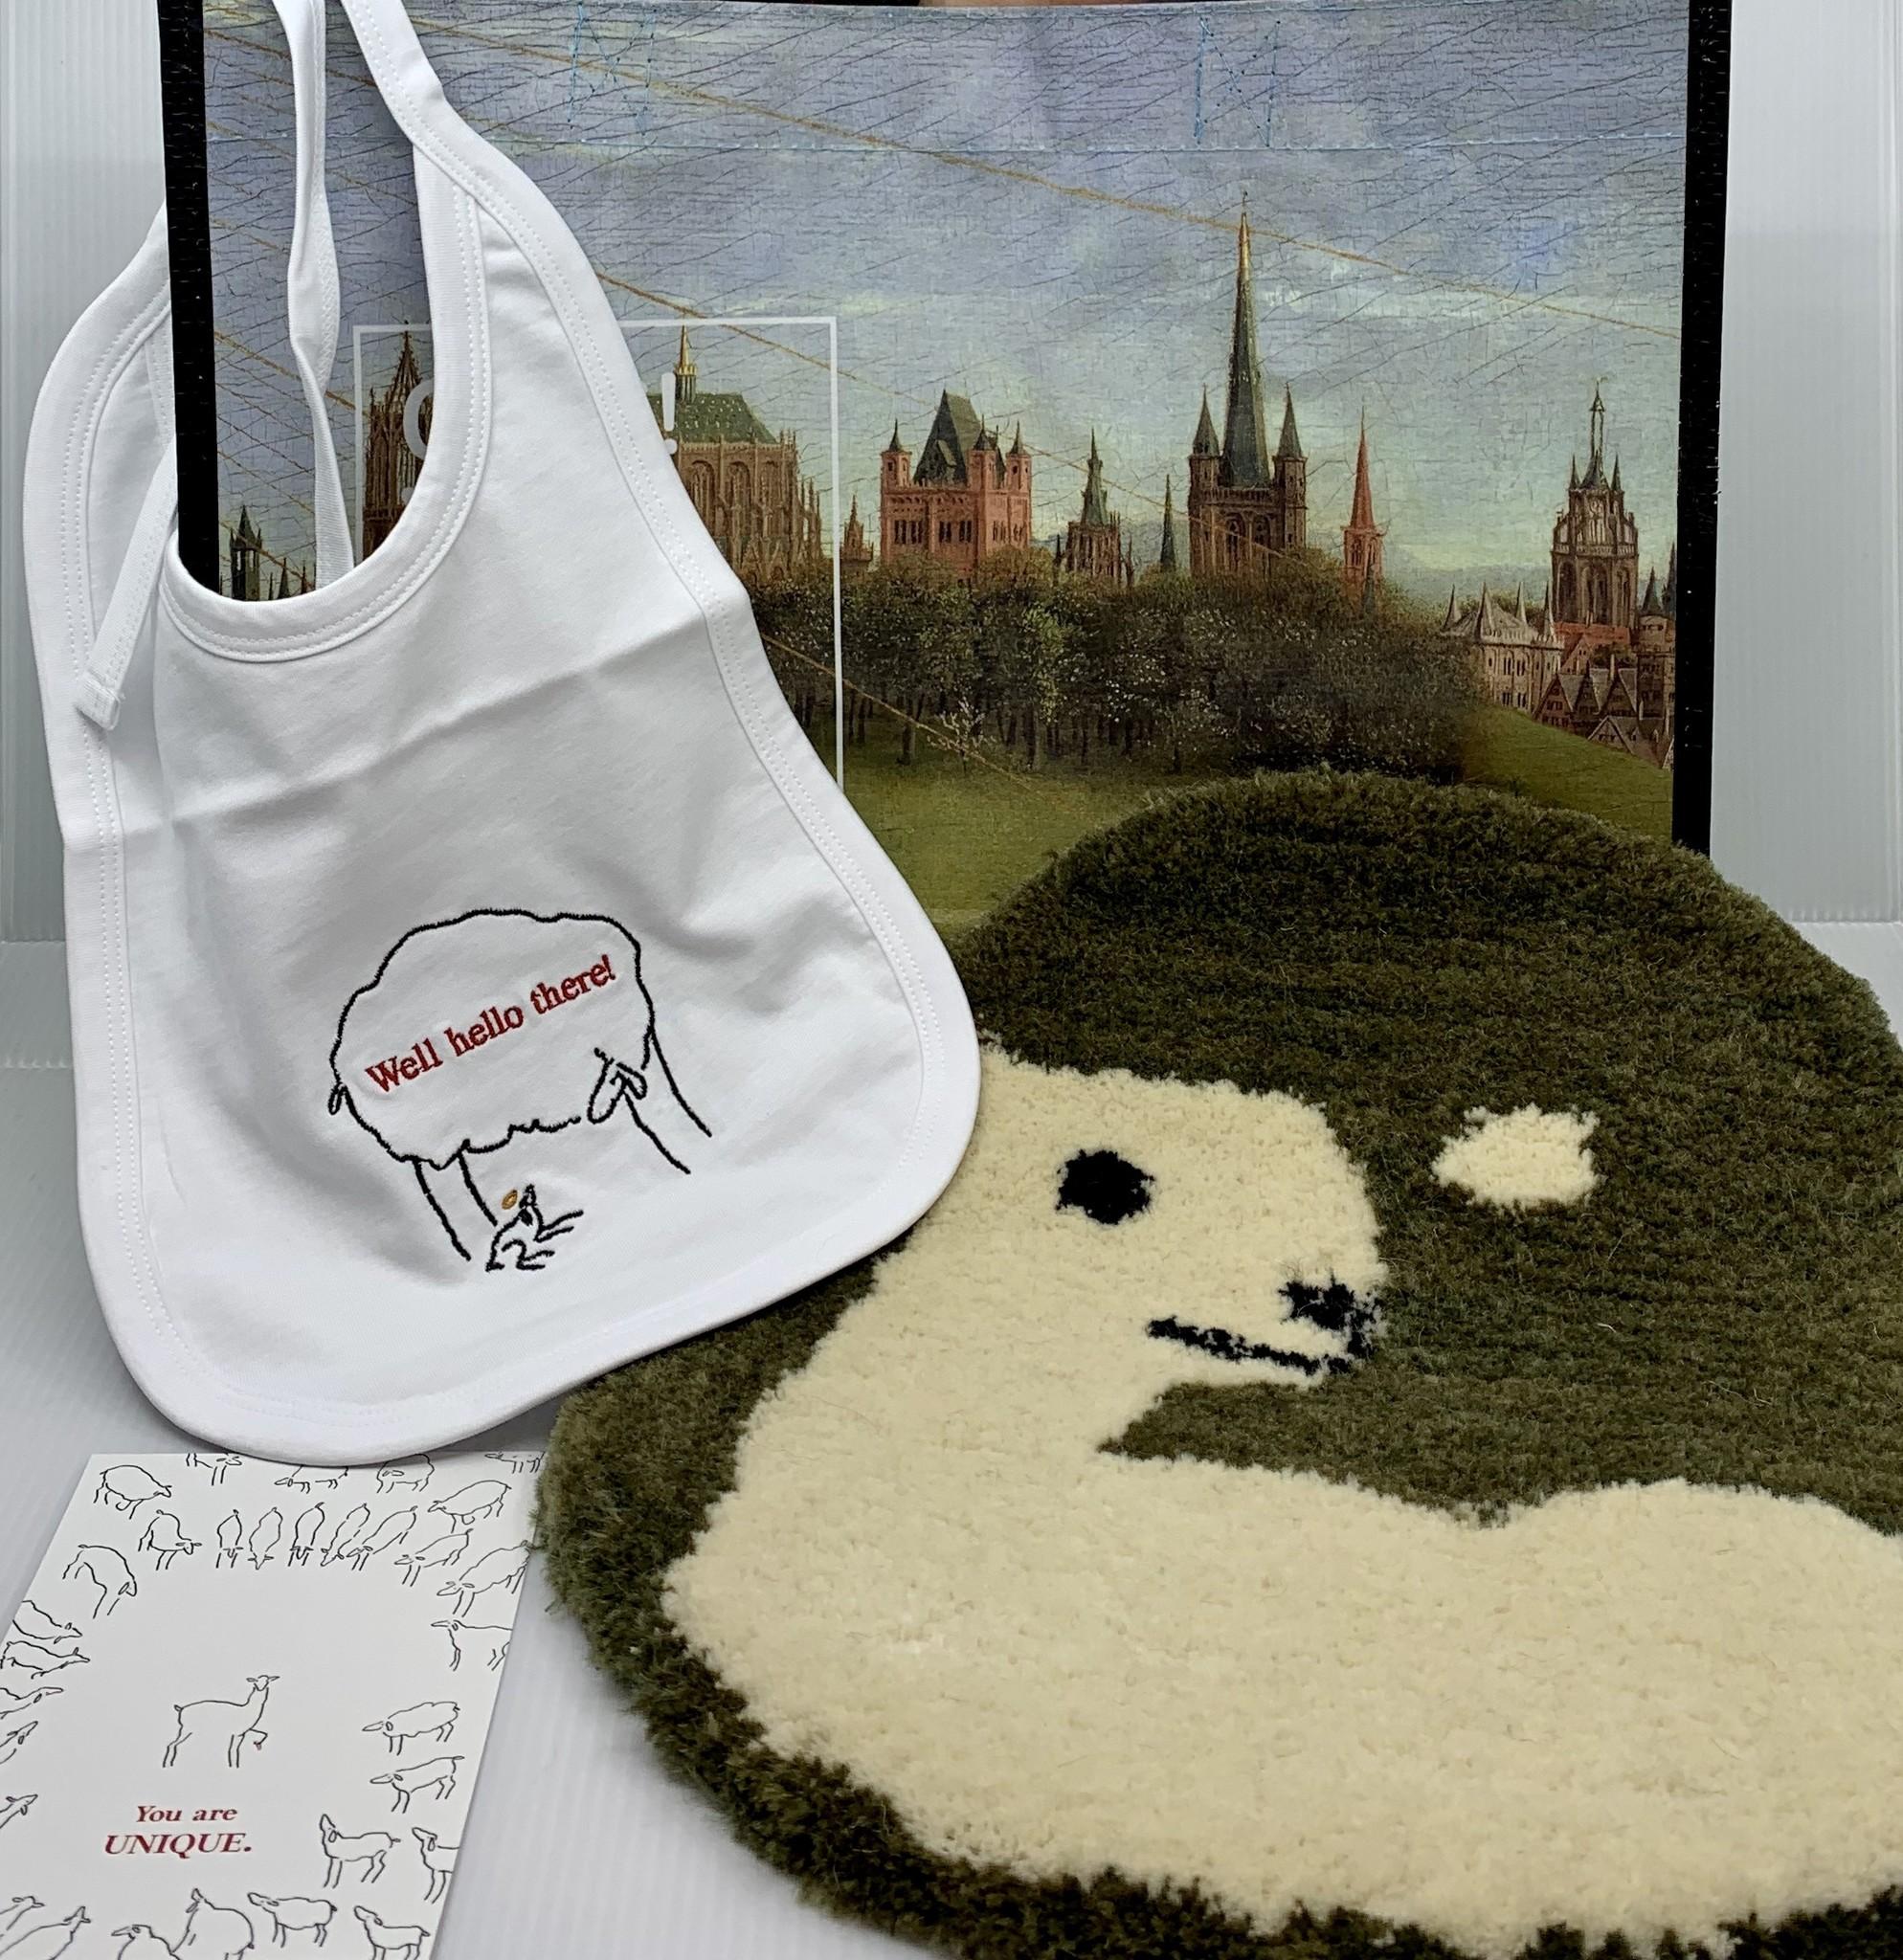 Van Eyck shop Cadeaupakket 'Hello There': slabbetje, tapijtje, kaartje, tas